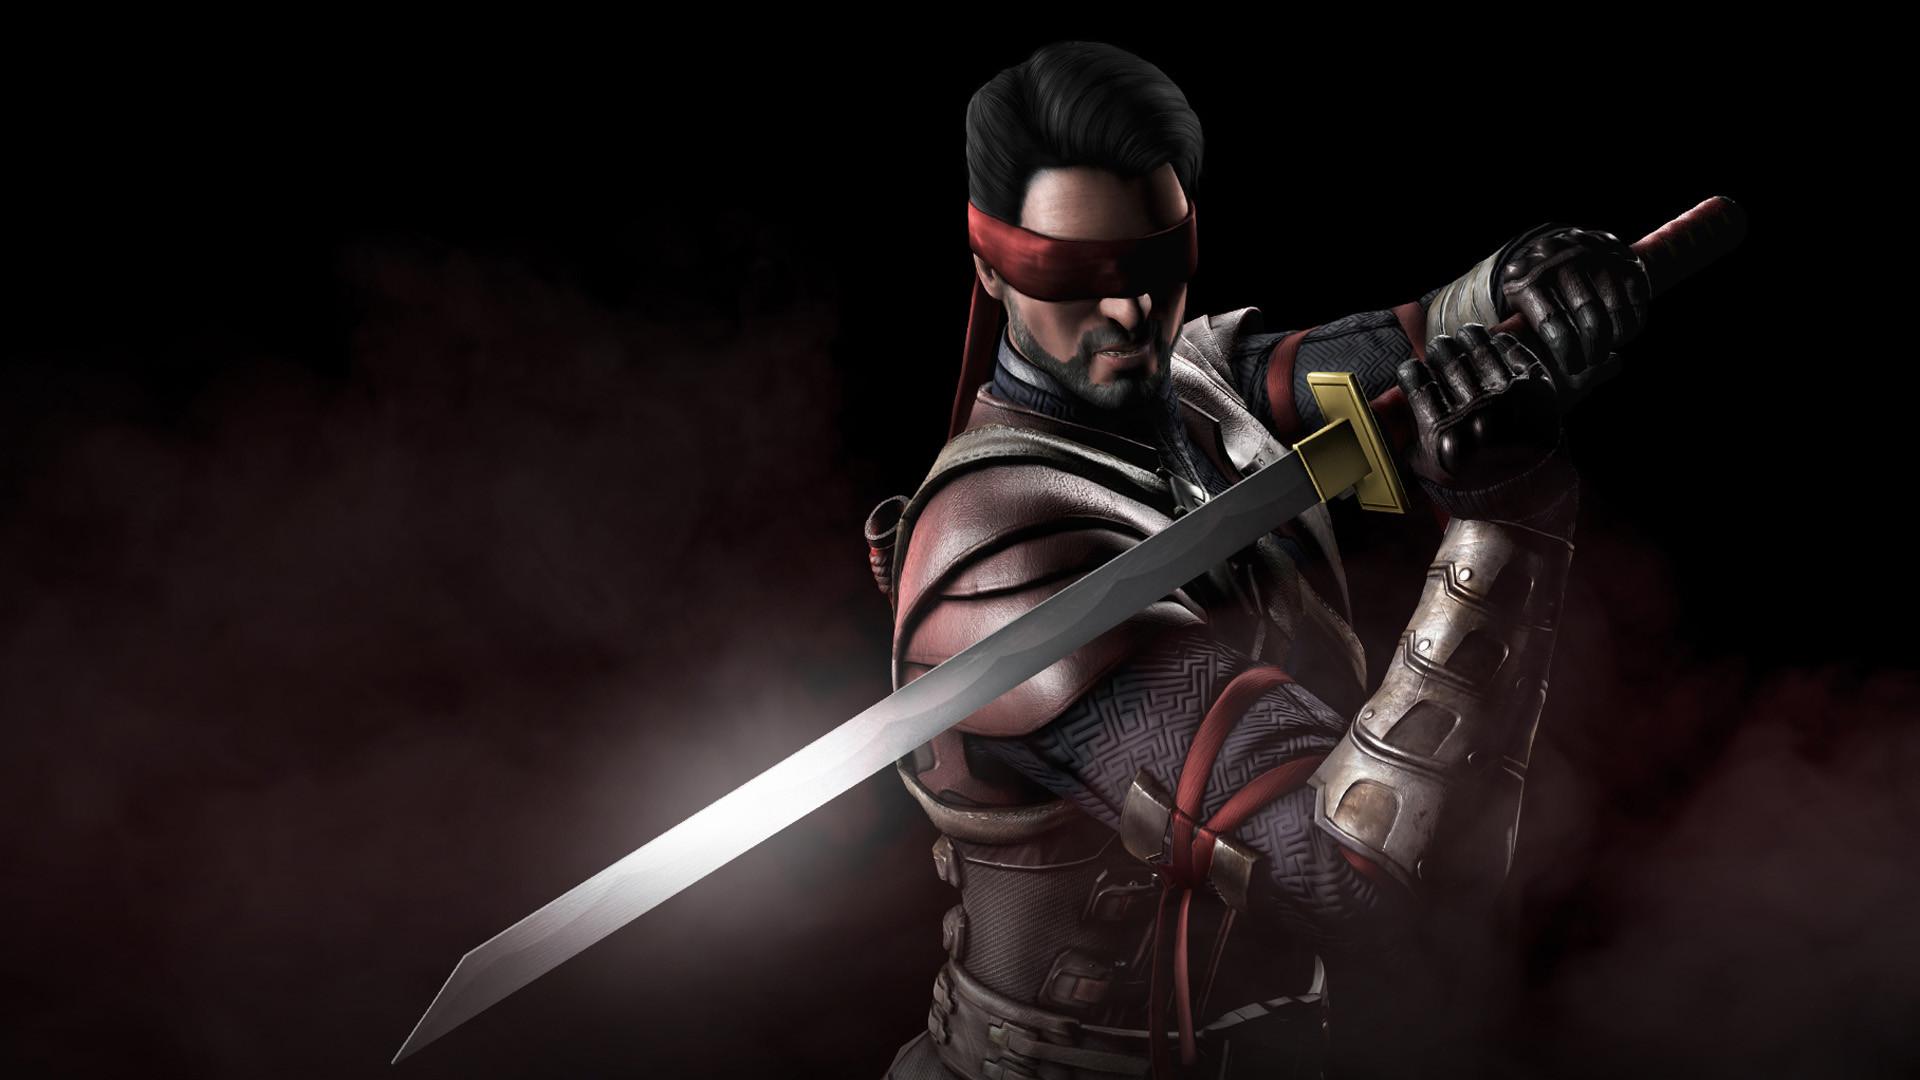 Die besten 20+ Mortal Kombat x wallpaper Ideen auf Pinterest | Mortal kombat,  Sub zero mortal kombat und Mortal kombat x